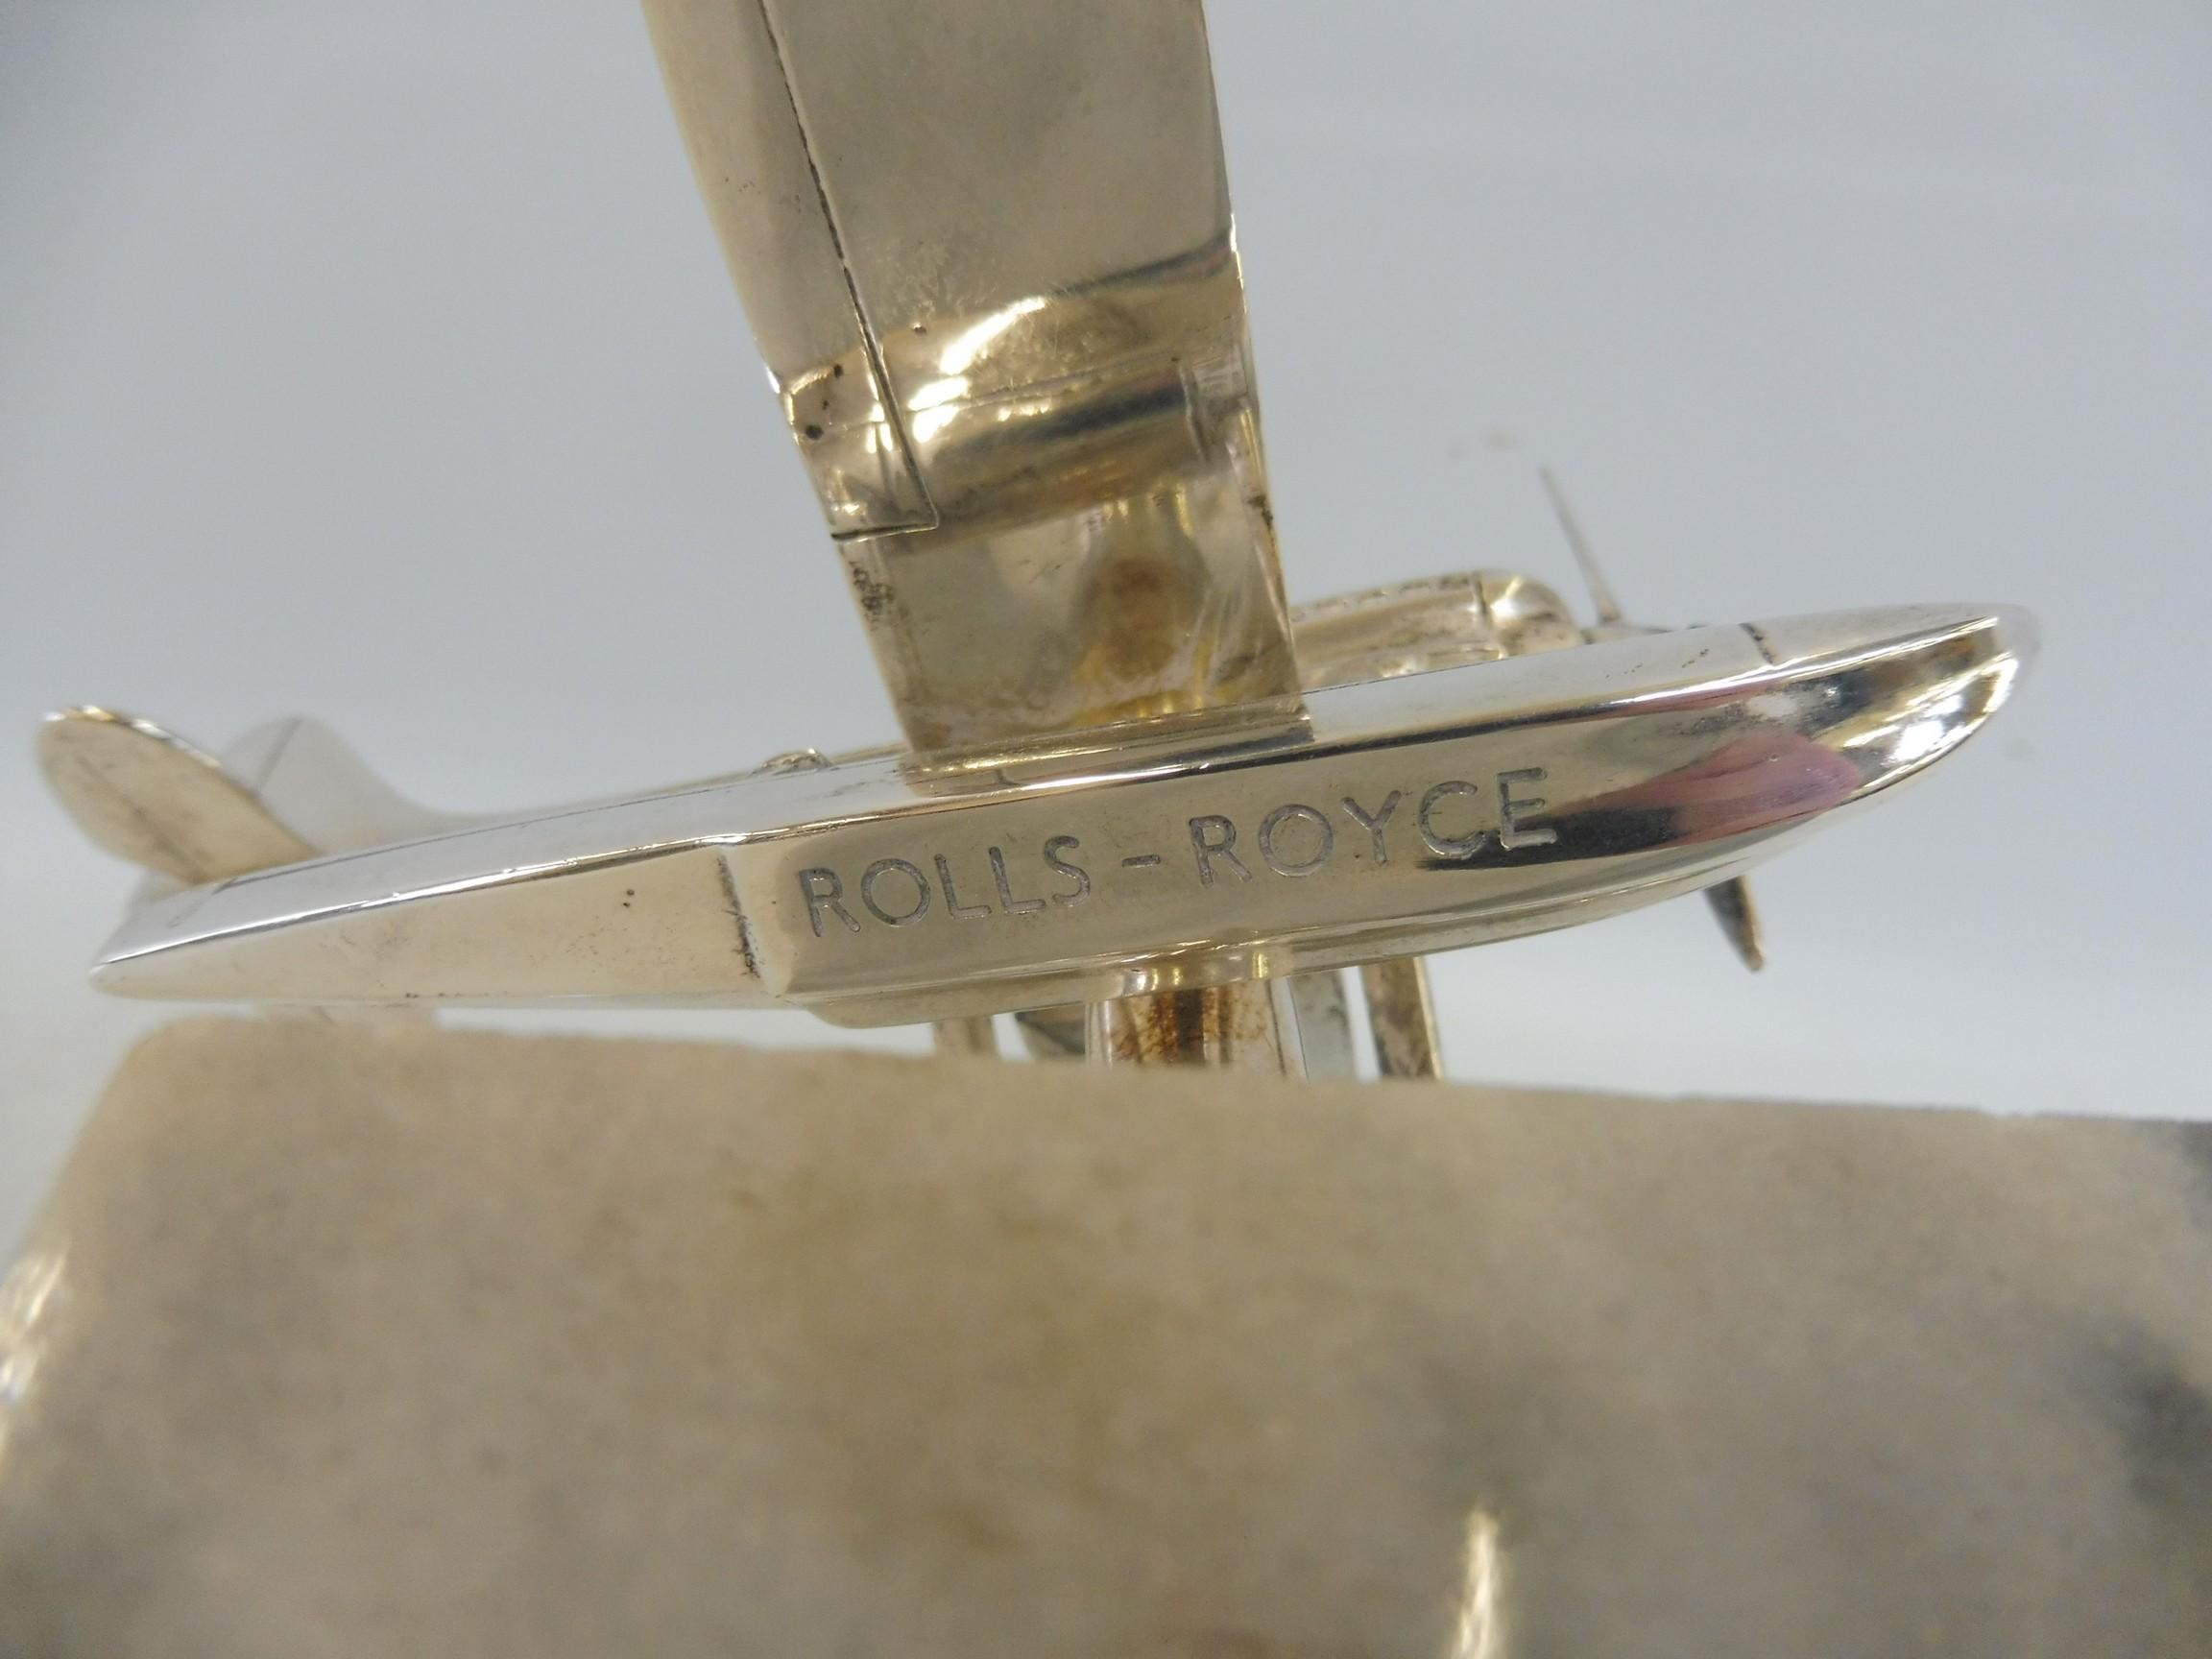 A Schneider Trophy seaplane supermarine mascot, nickel plated, inscribed 'Rolls-Royce' under one - Image 5 of 6